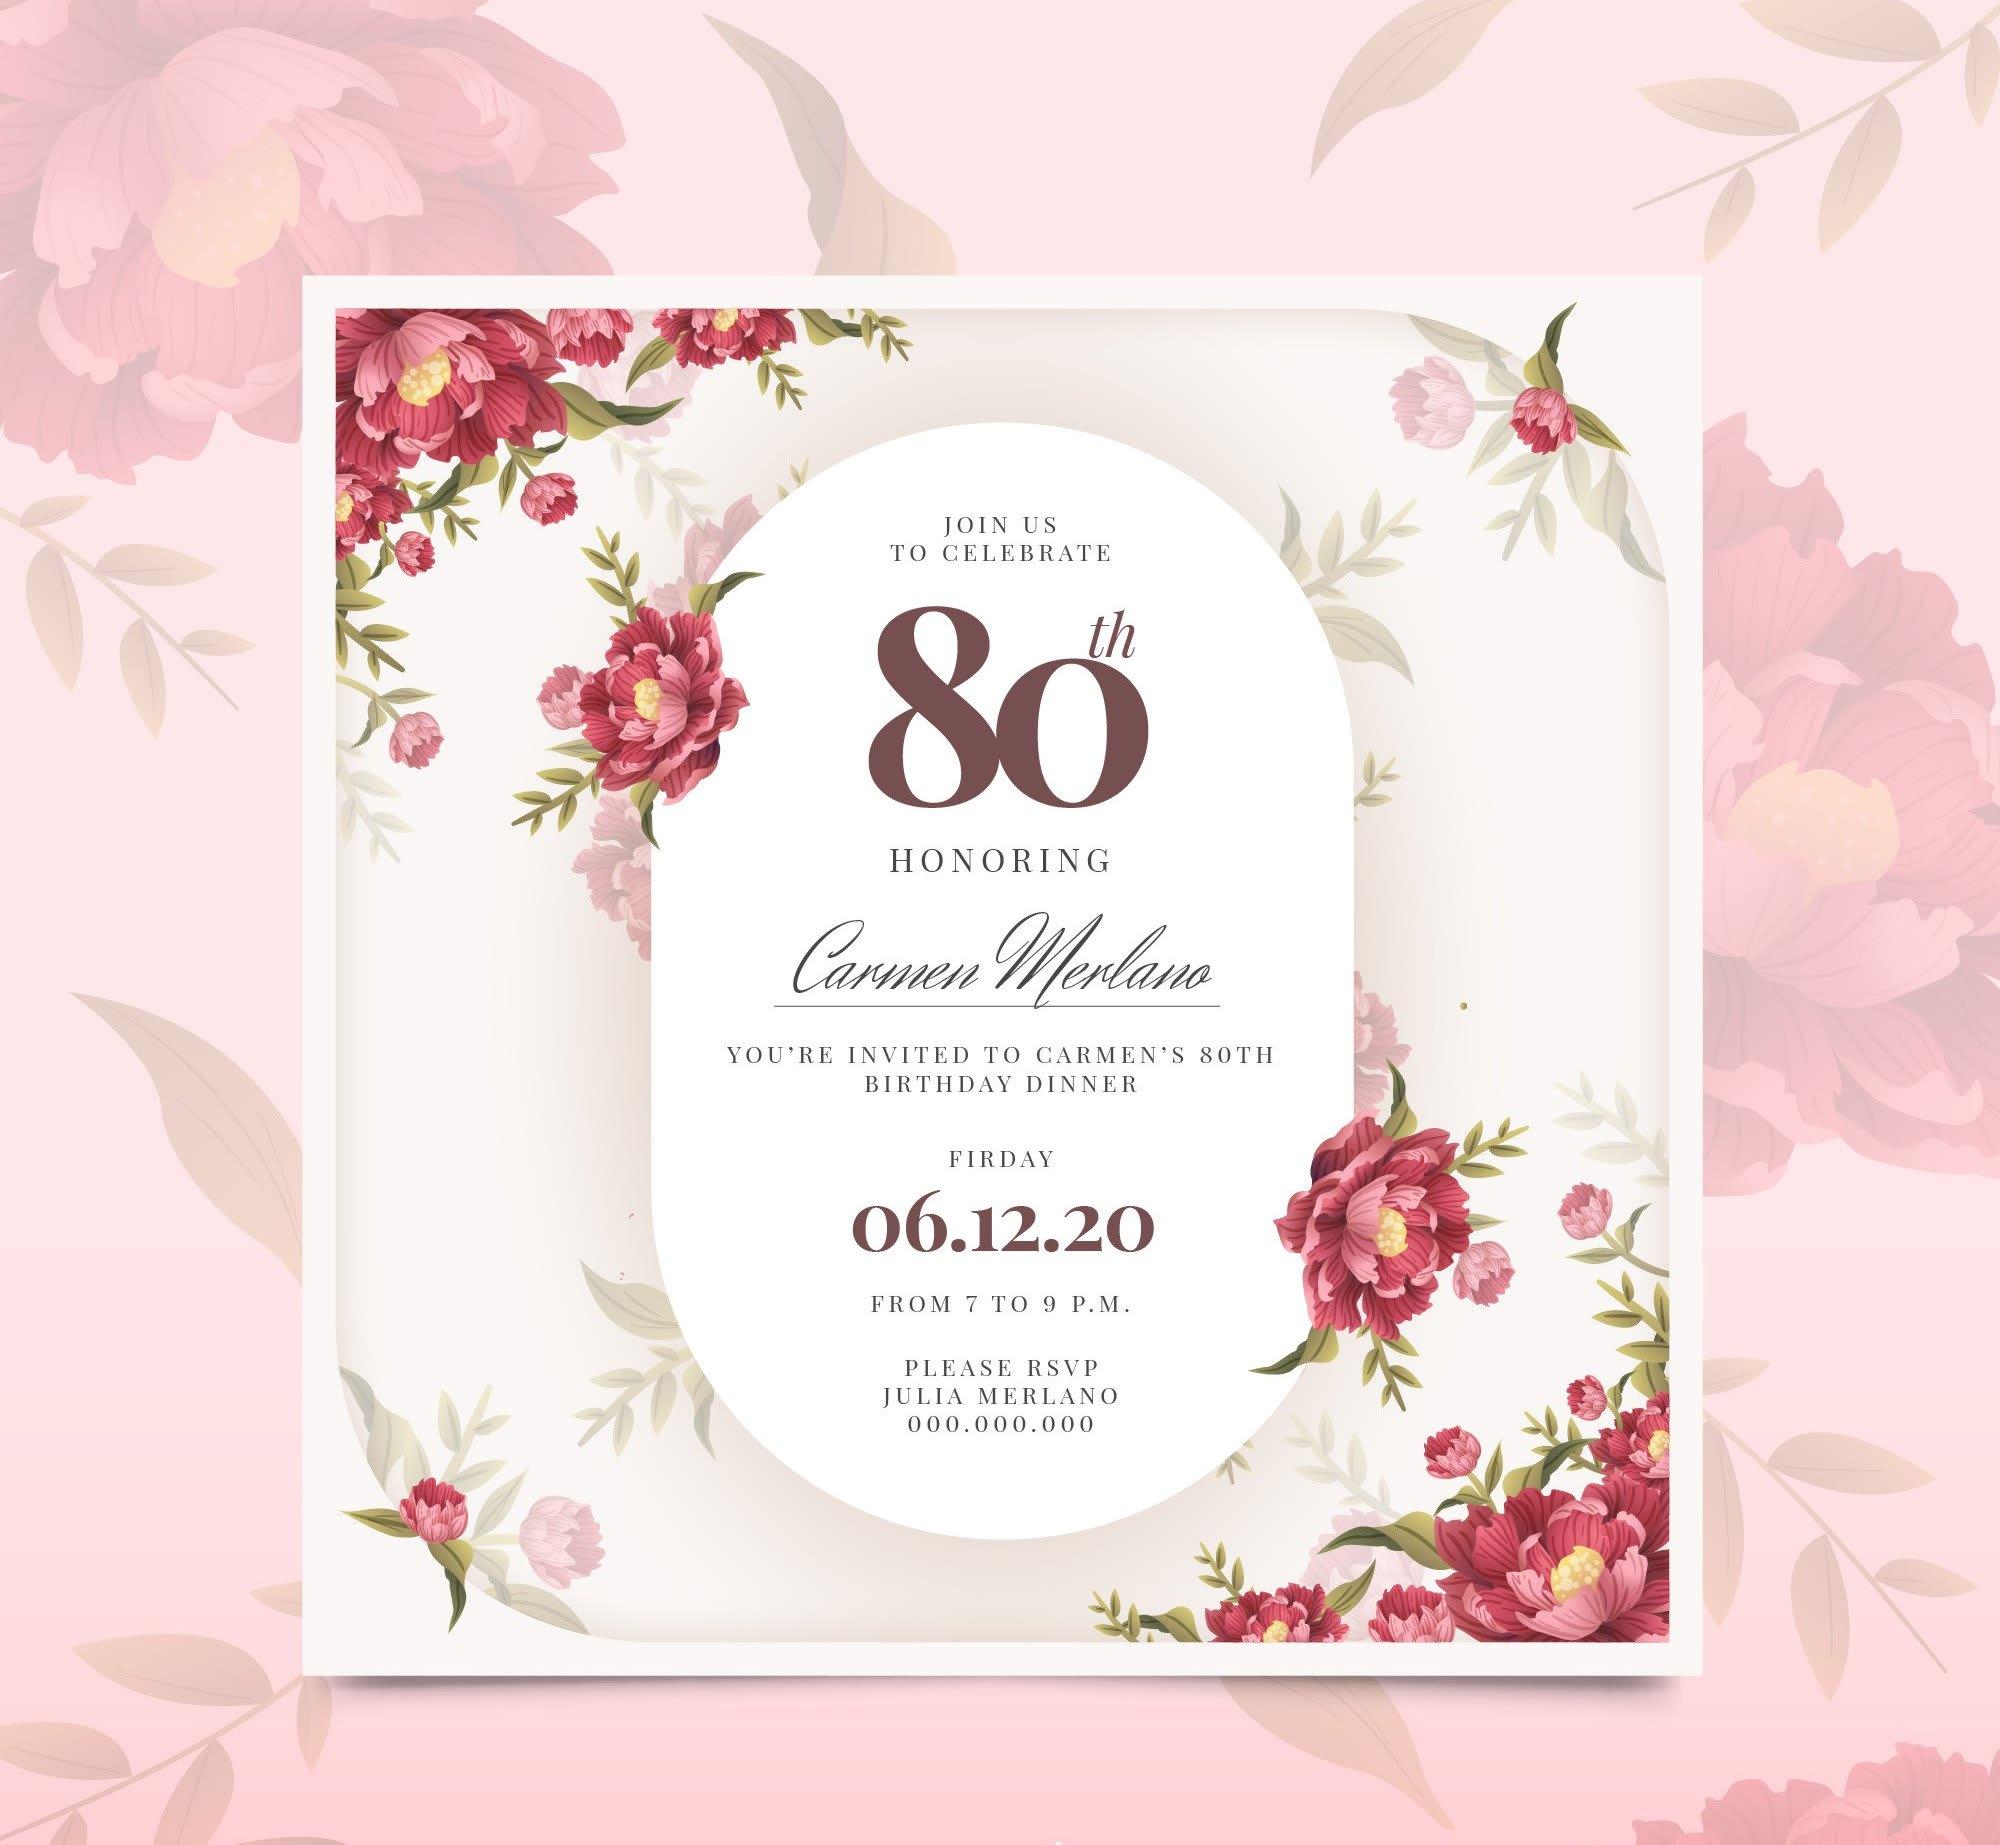 Design unique wedding and birthday invitation card by Nadeem_jamil